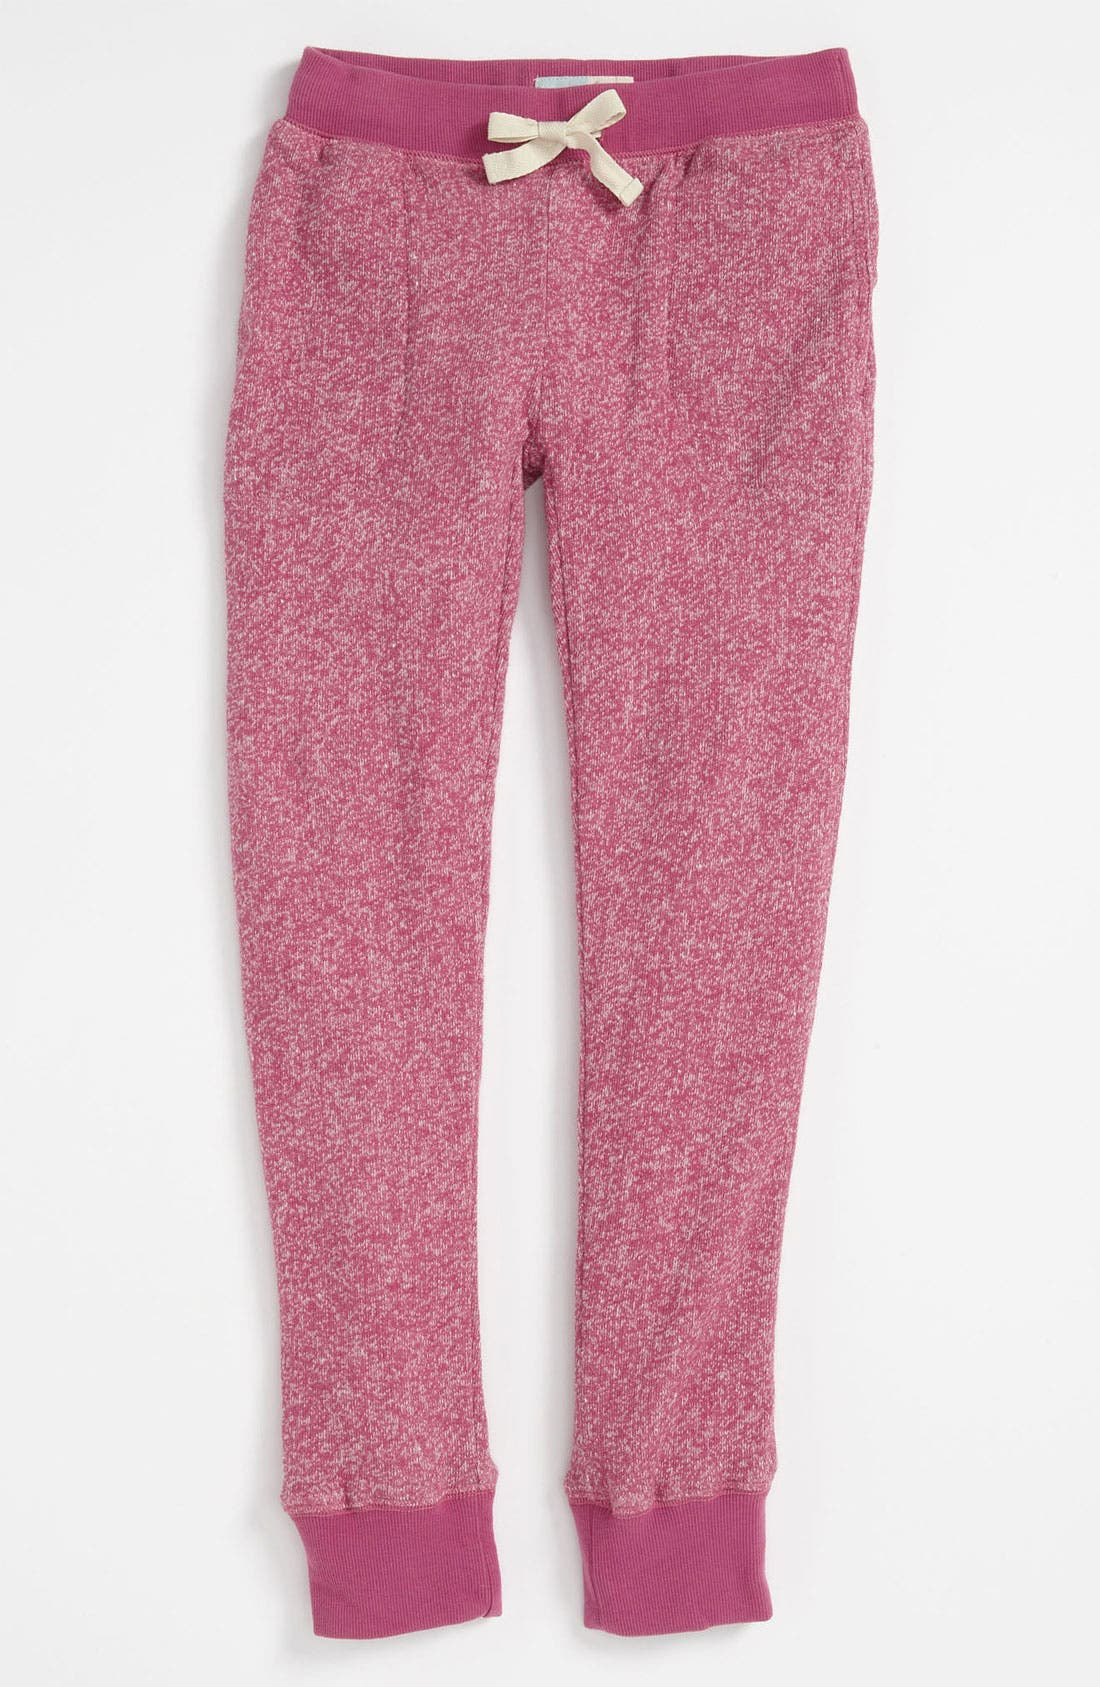 Alternate Image 1 Selected - Peek 'Luxury' Pants (Toddler, Little Girls & Big Girls)